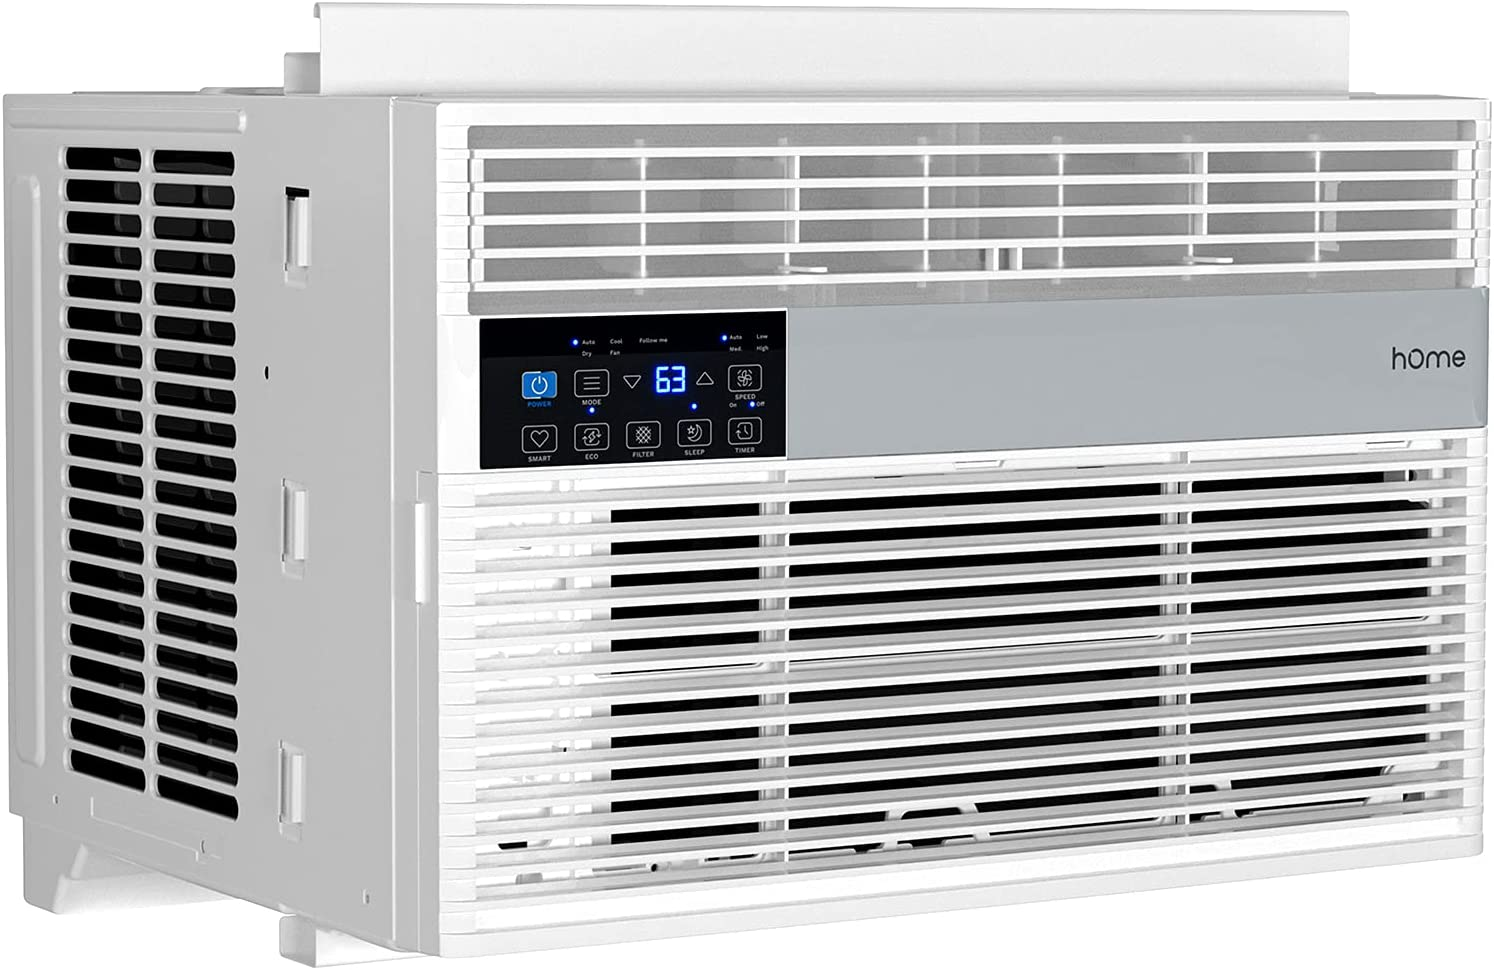 hOmelabs 6 000 BTU Window Air Smart Conditioner famous âwith half Control